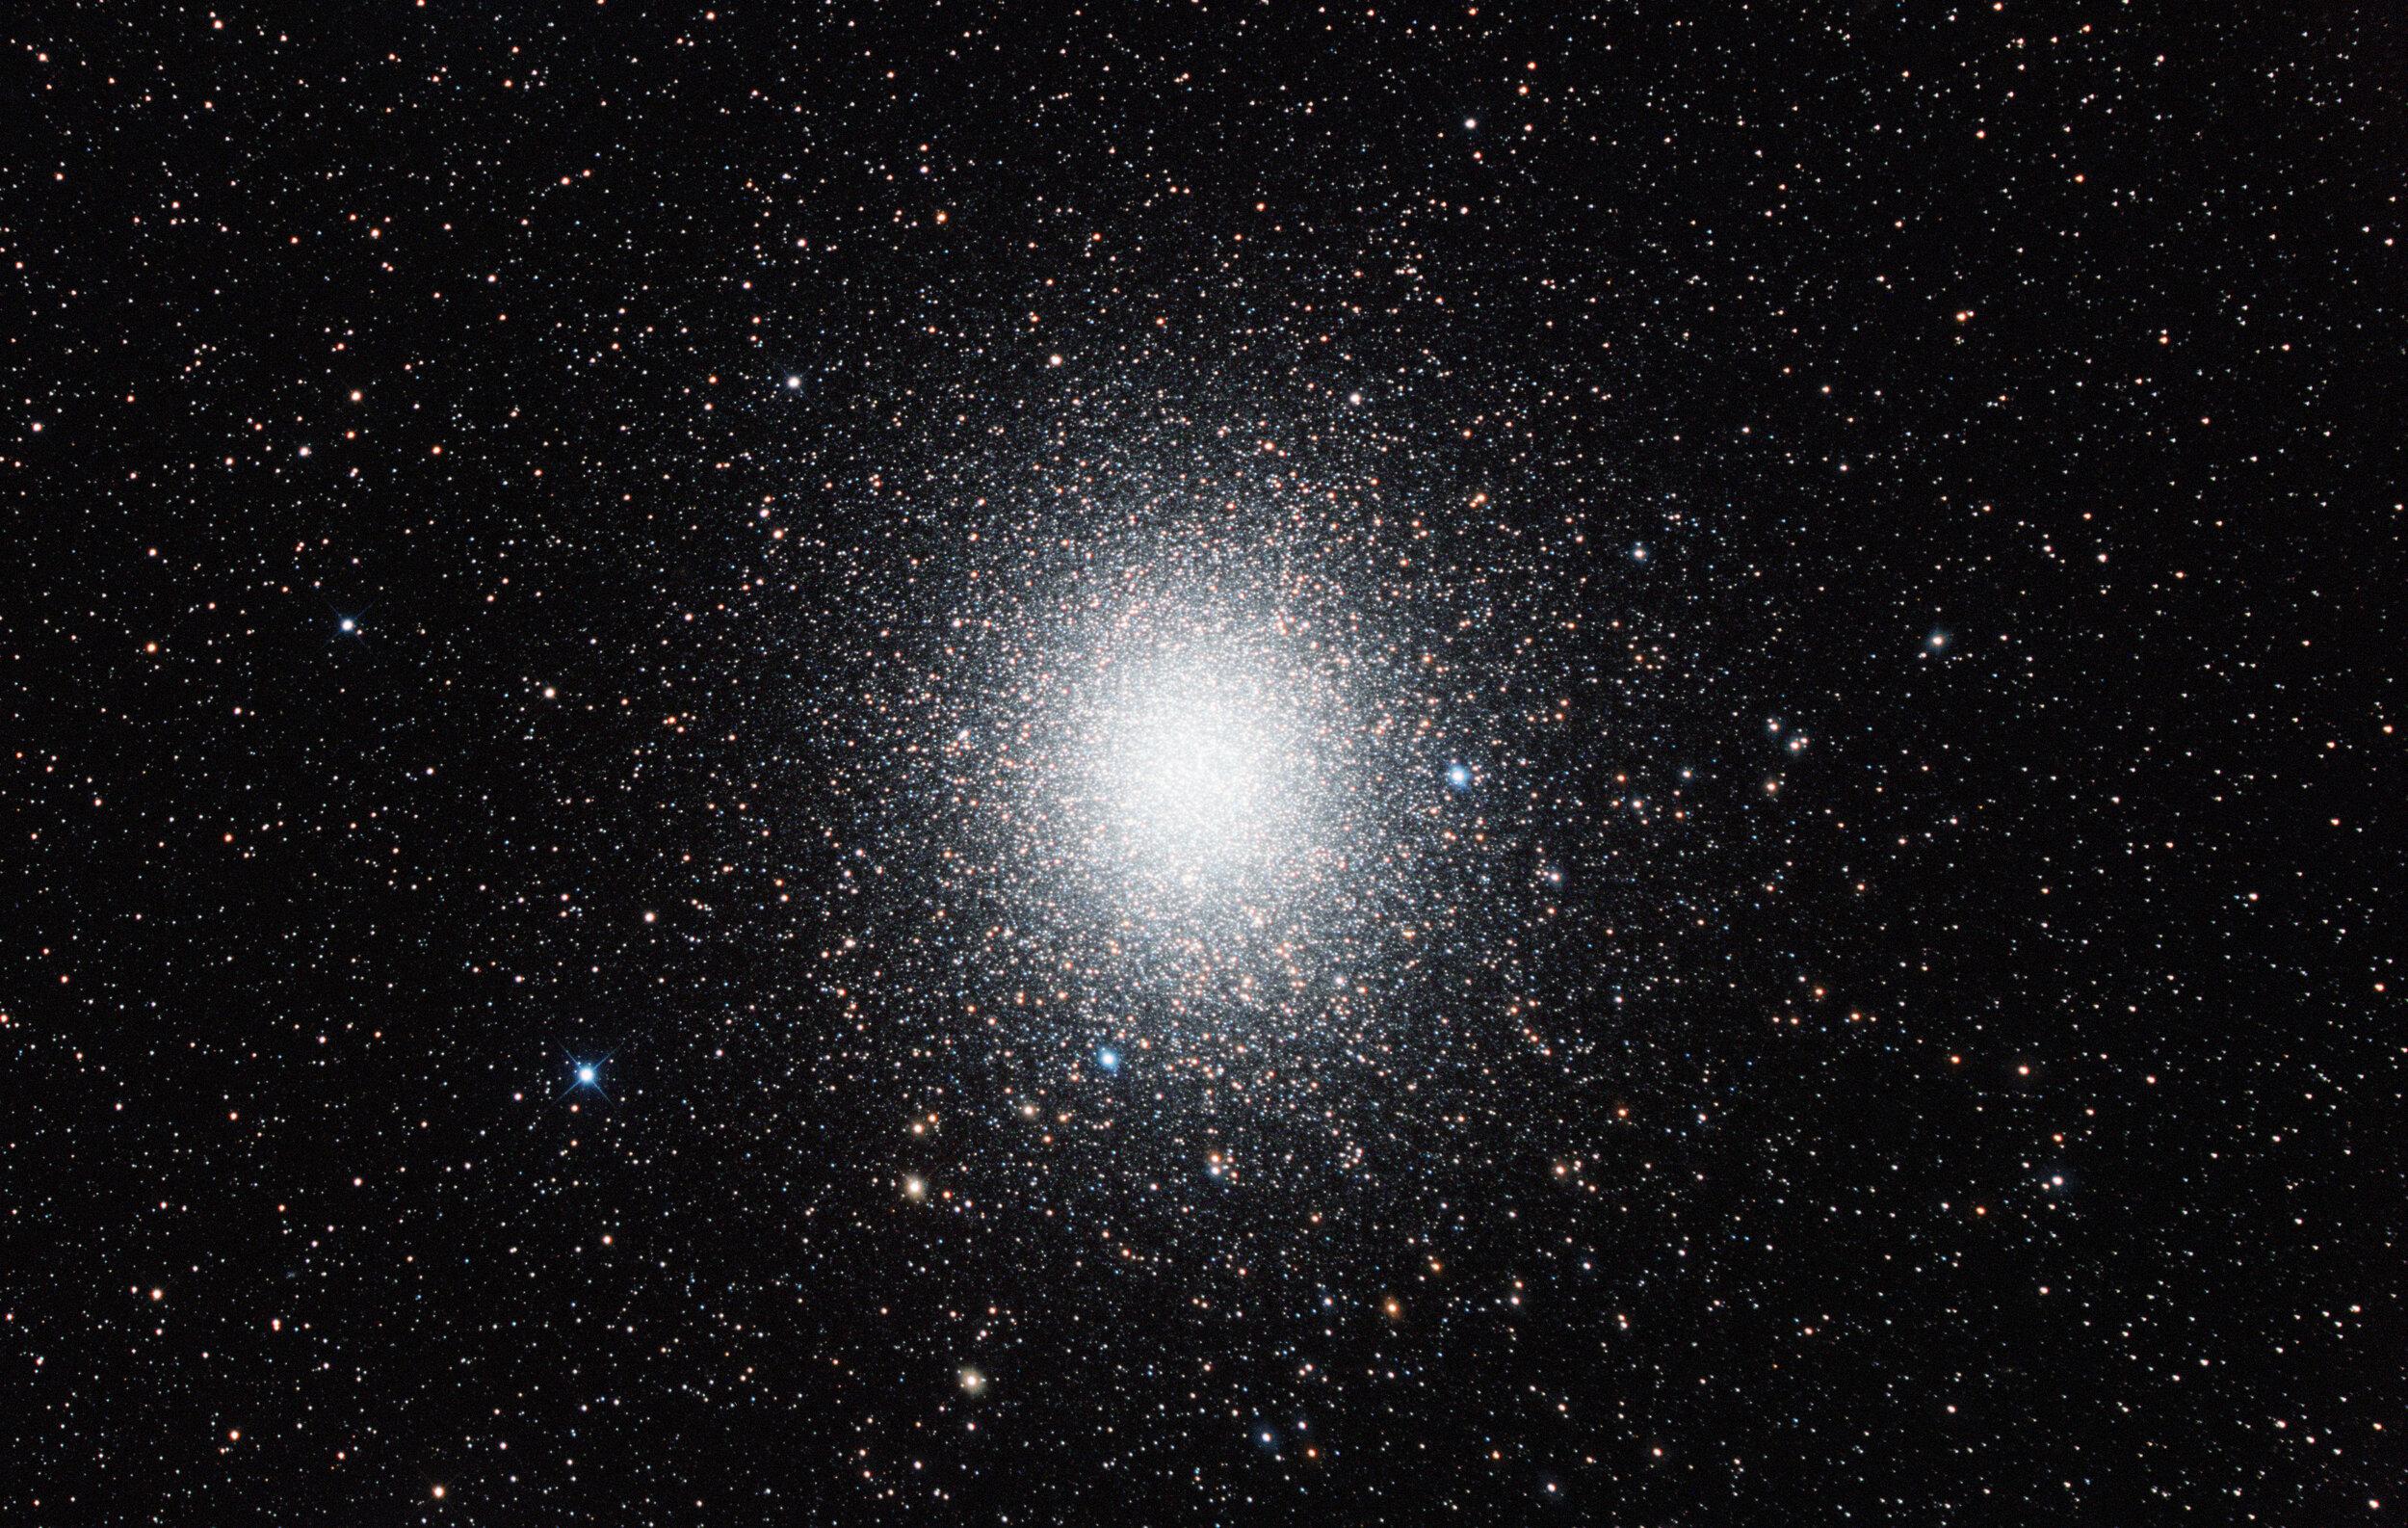 NGC 5139 Omega Centari Cluster